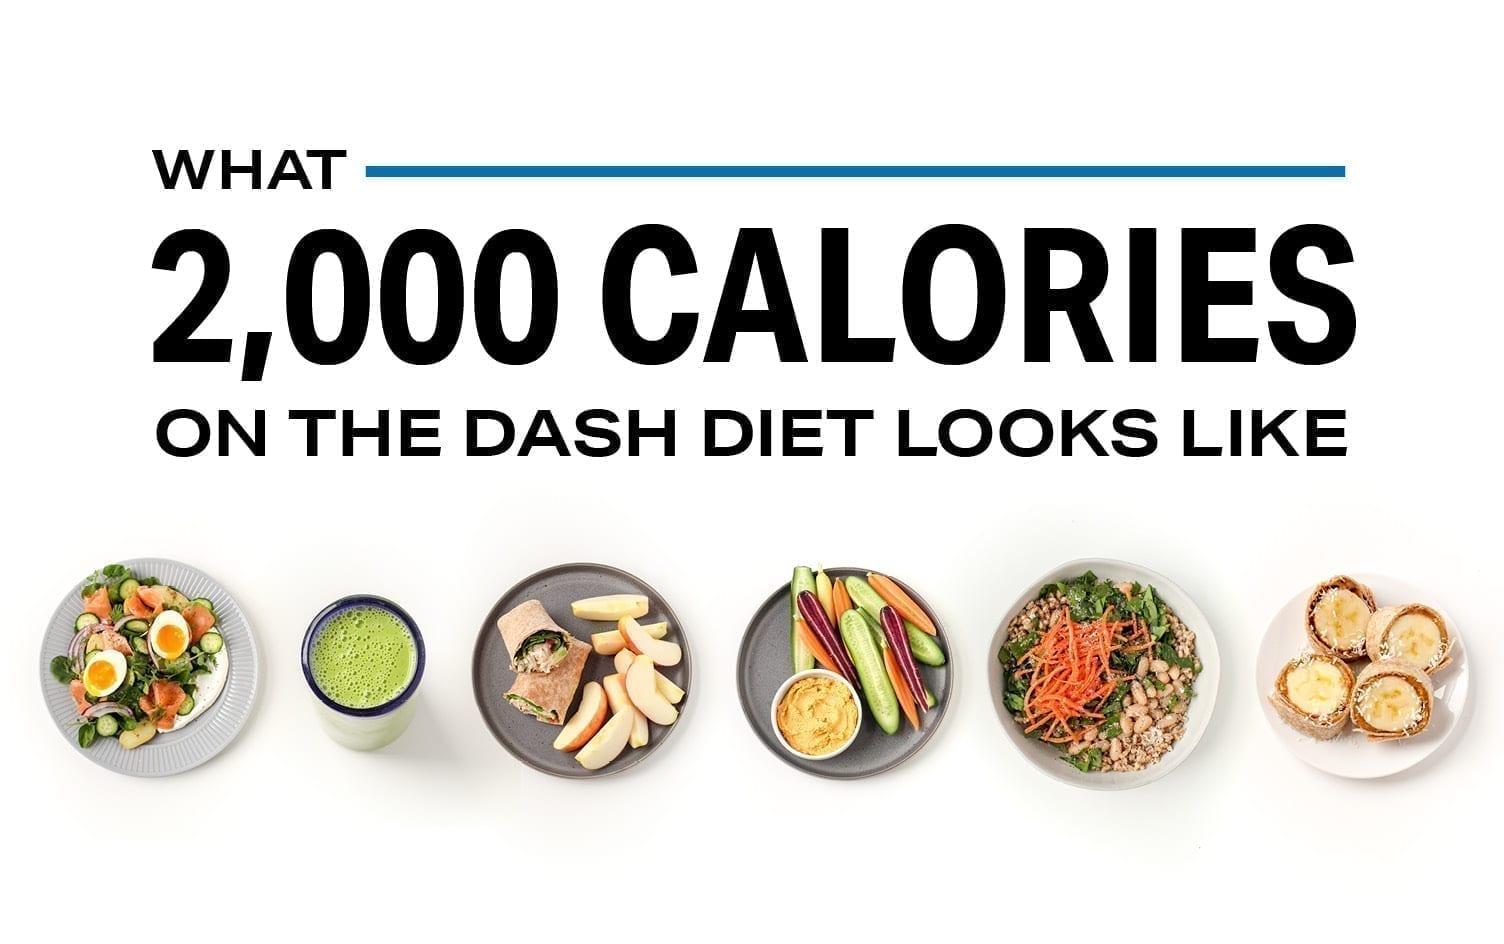 dash diet 2400 calories